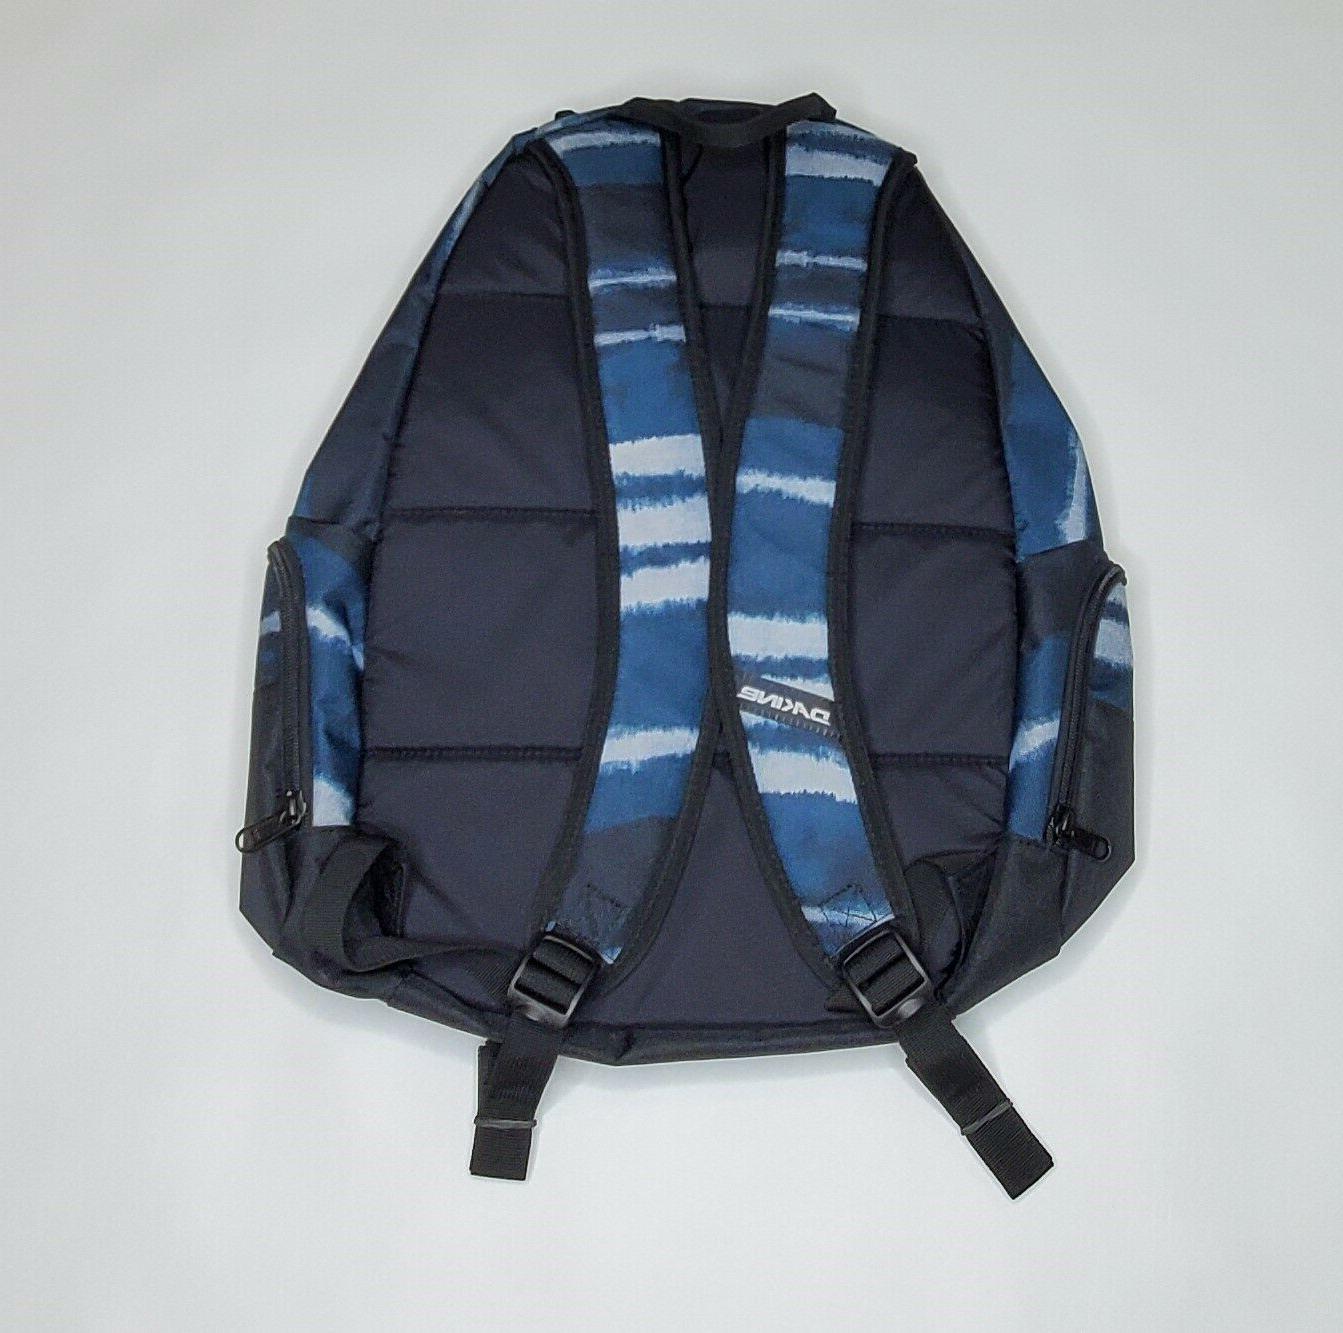 DAKINE Backpack 25L Skateboard Laptop Sleeve